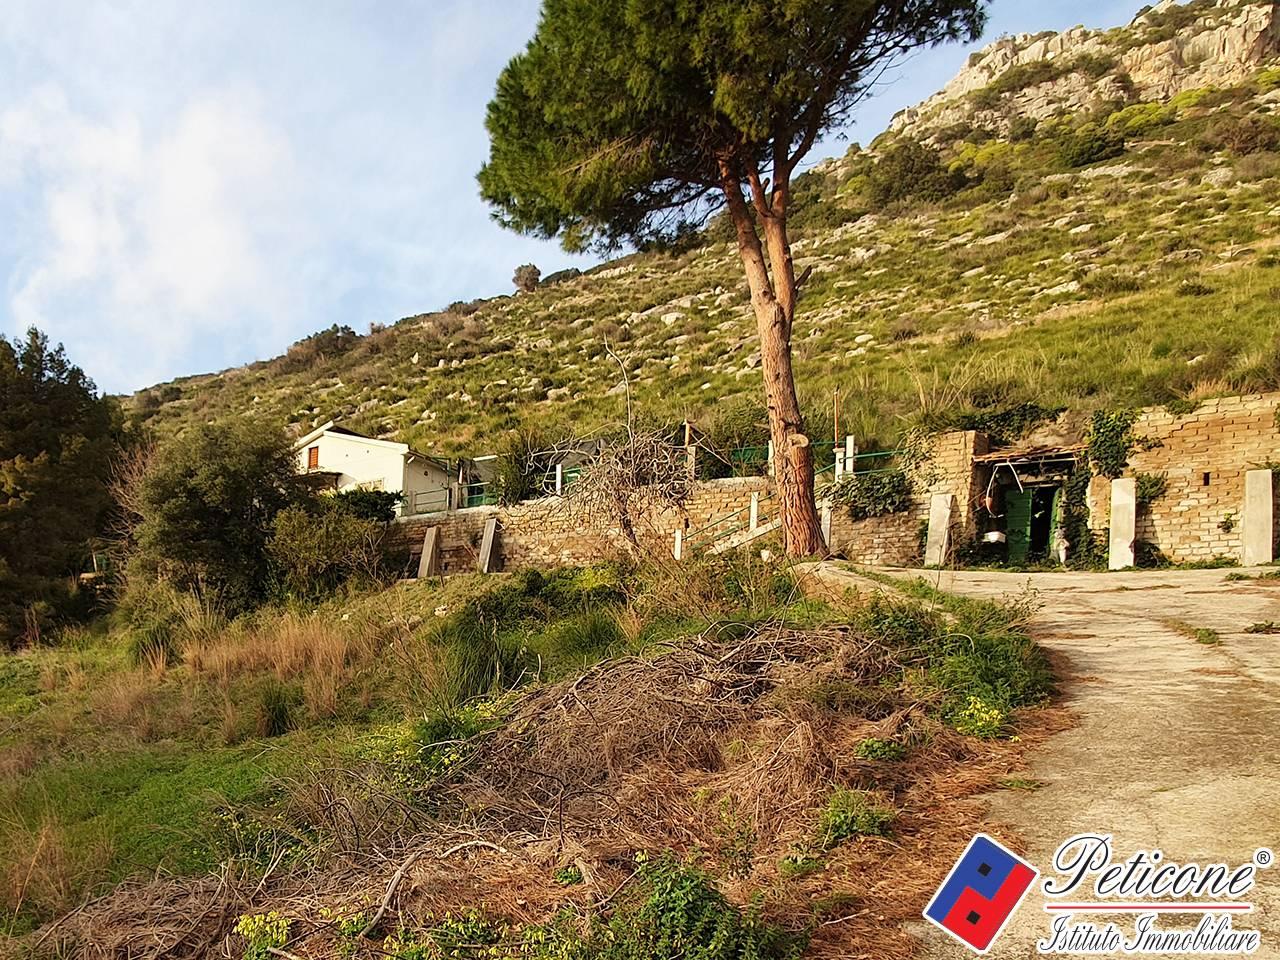 Villa in Vendita a Sperlonga: 3 locali, 50 mq - Foto 3